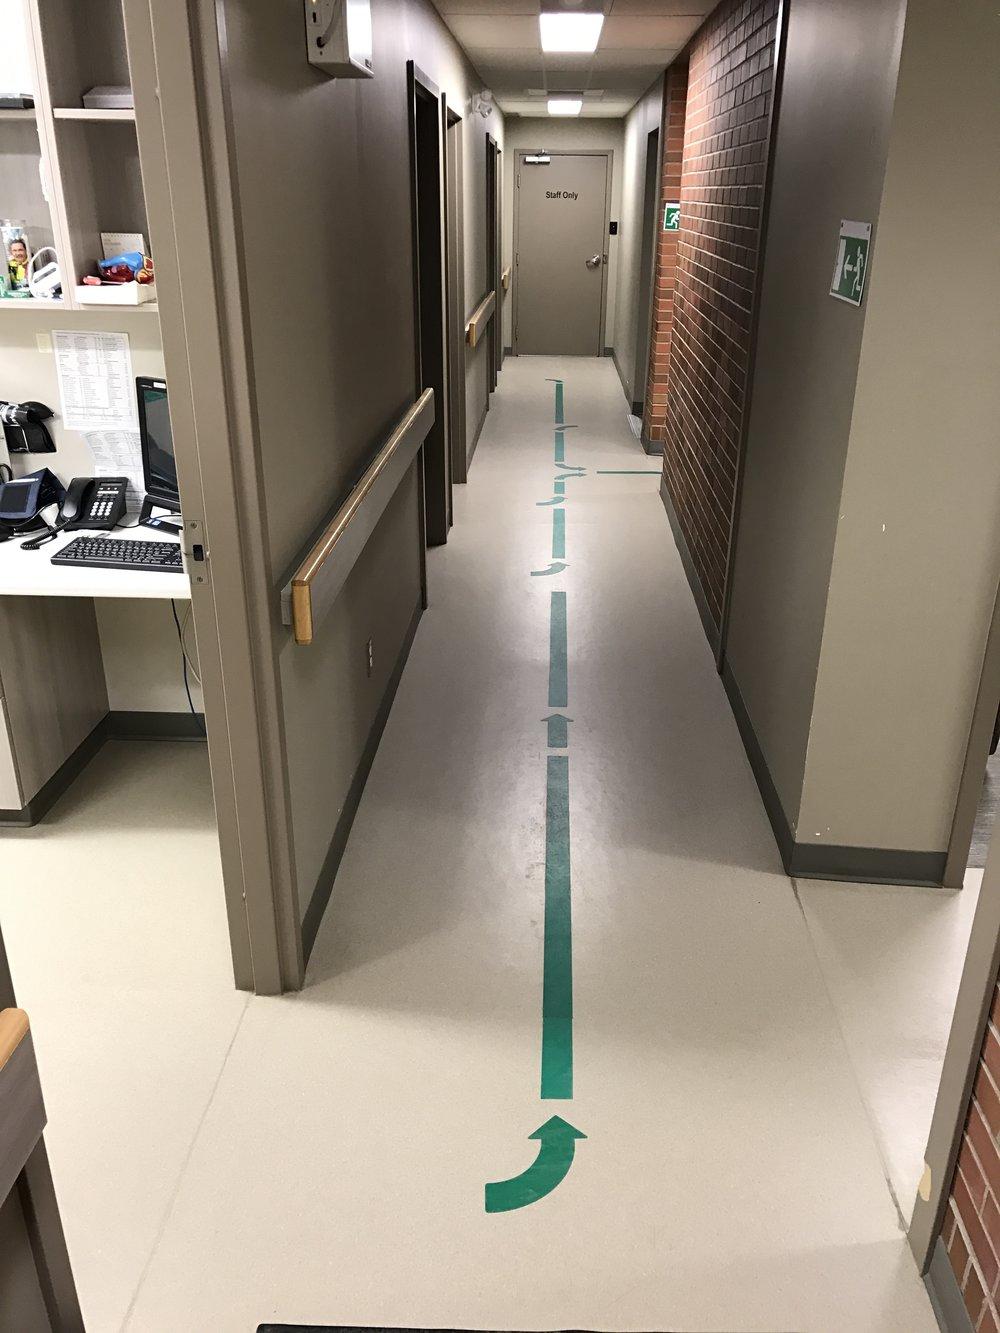 Medical racetrack clinic exit arrows